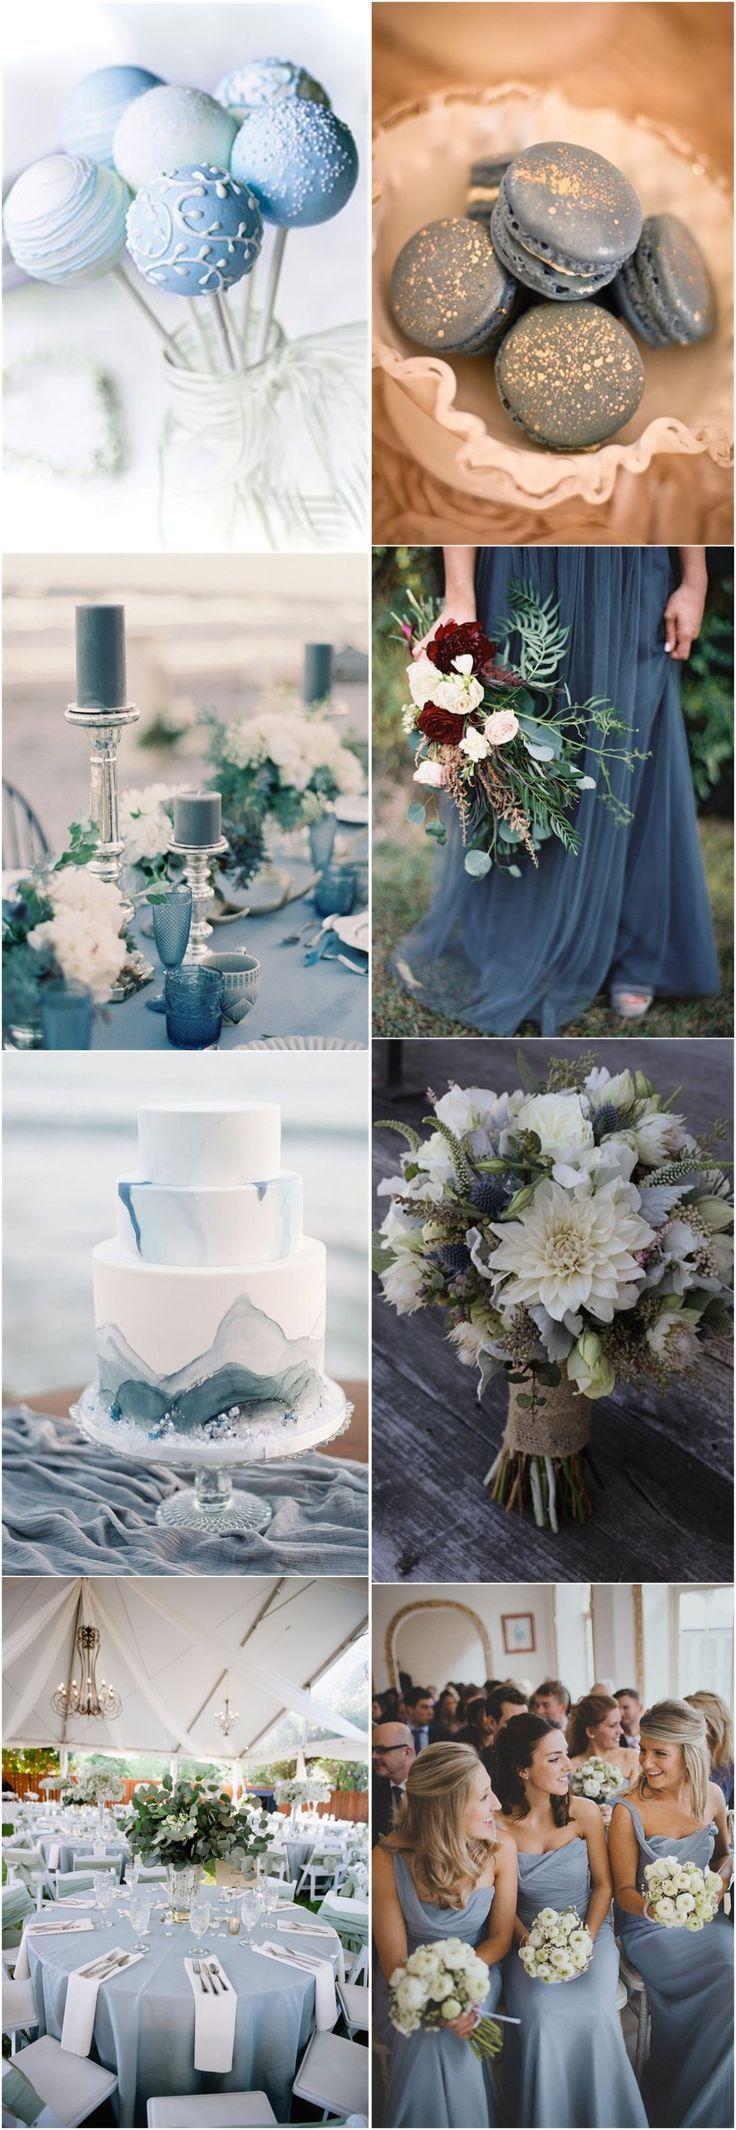 2019 Wedding Inspiration: Dusty Blue Wedding Color Ideas – Suzy Schettler